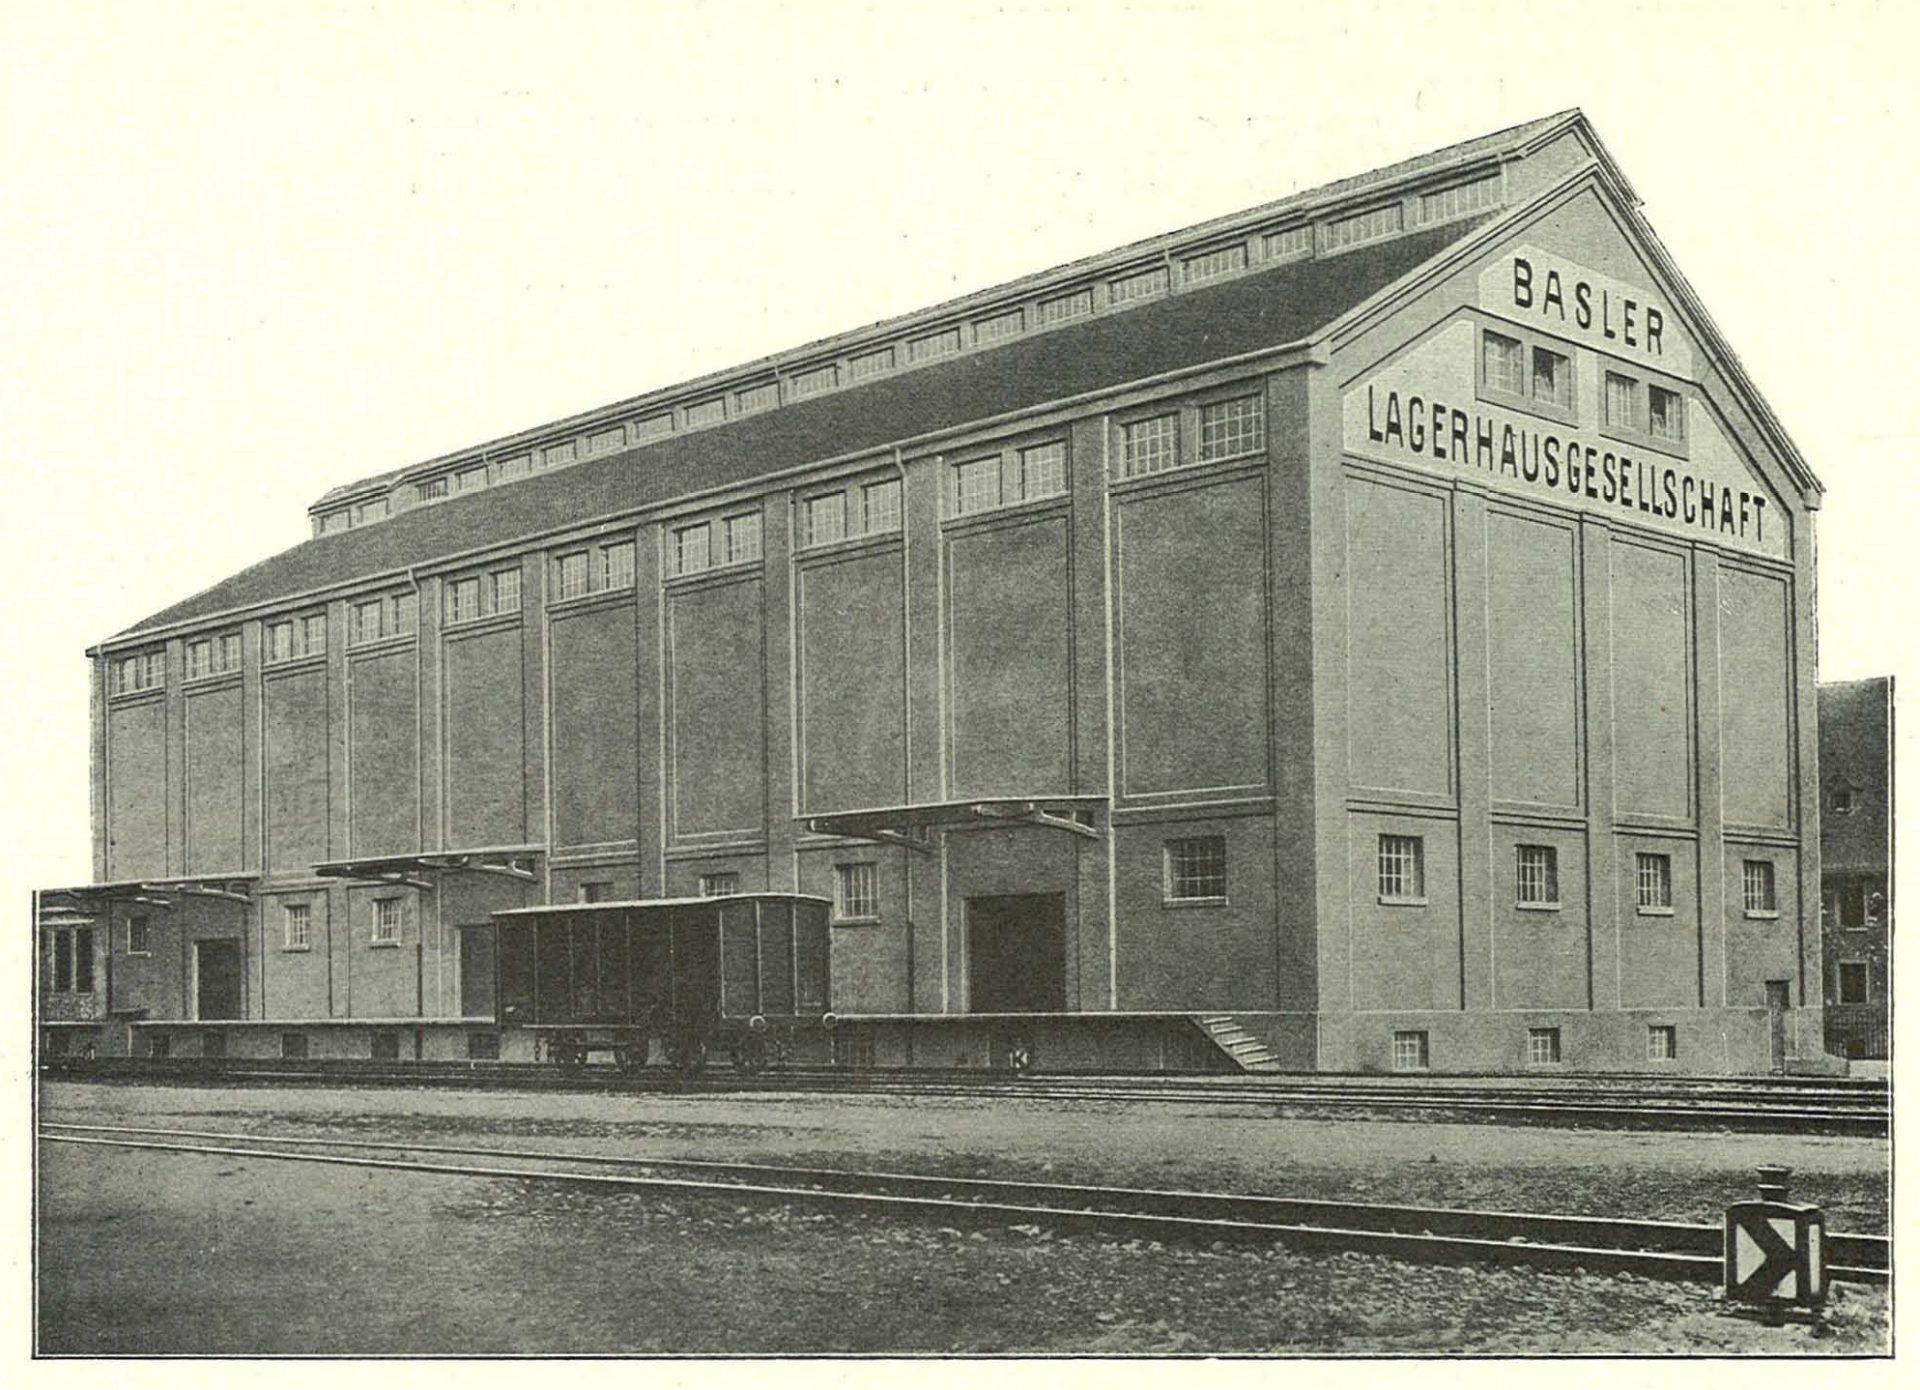 Historical picture from a brochure of Basler Lagerhausgesellschaf, 1912